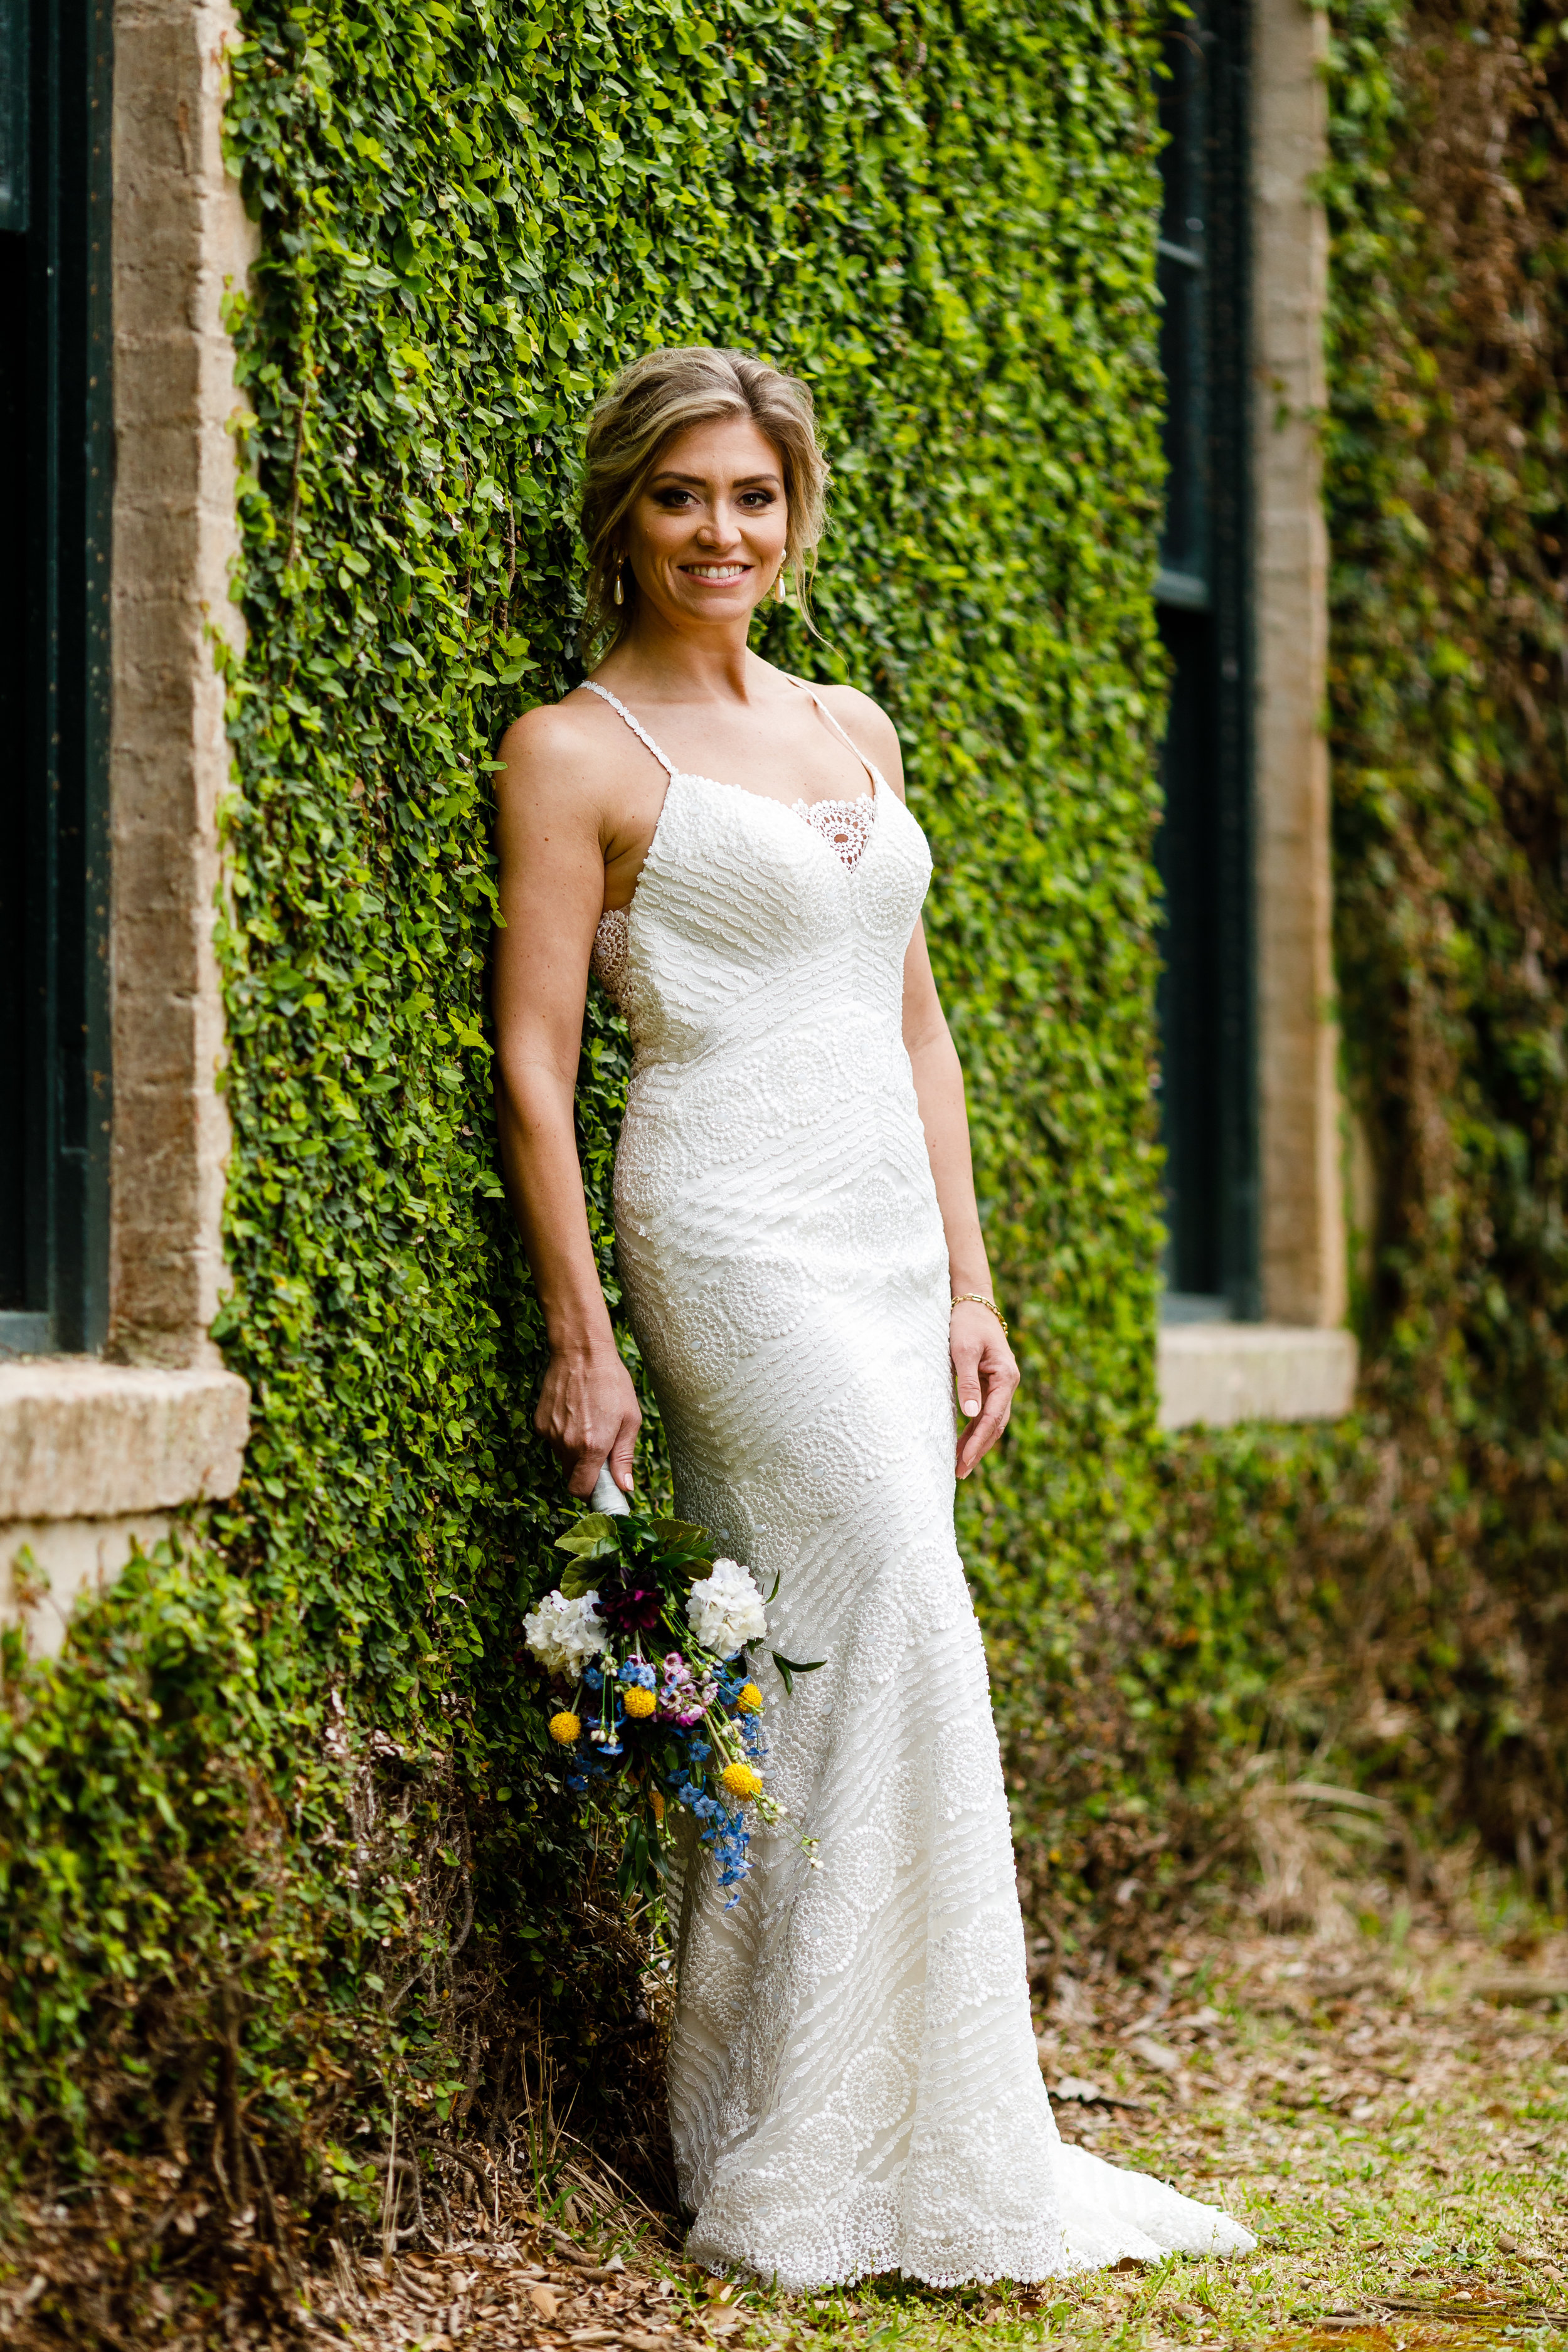 Youngsville-lafayette-portrait-family-wedding-photographer-2939.jpg